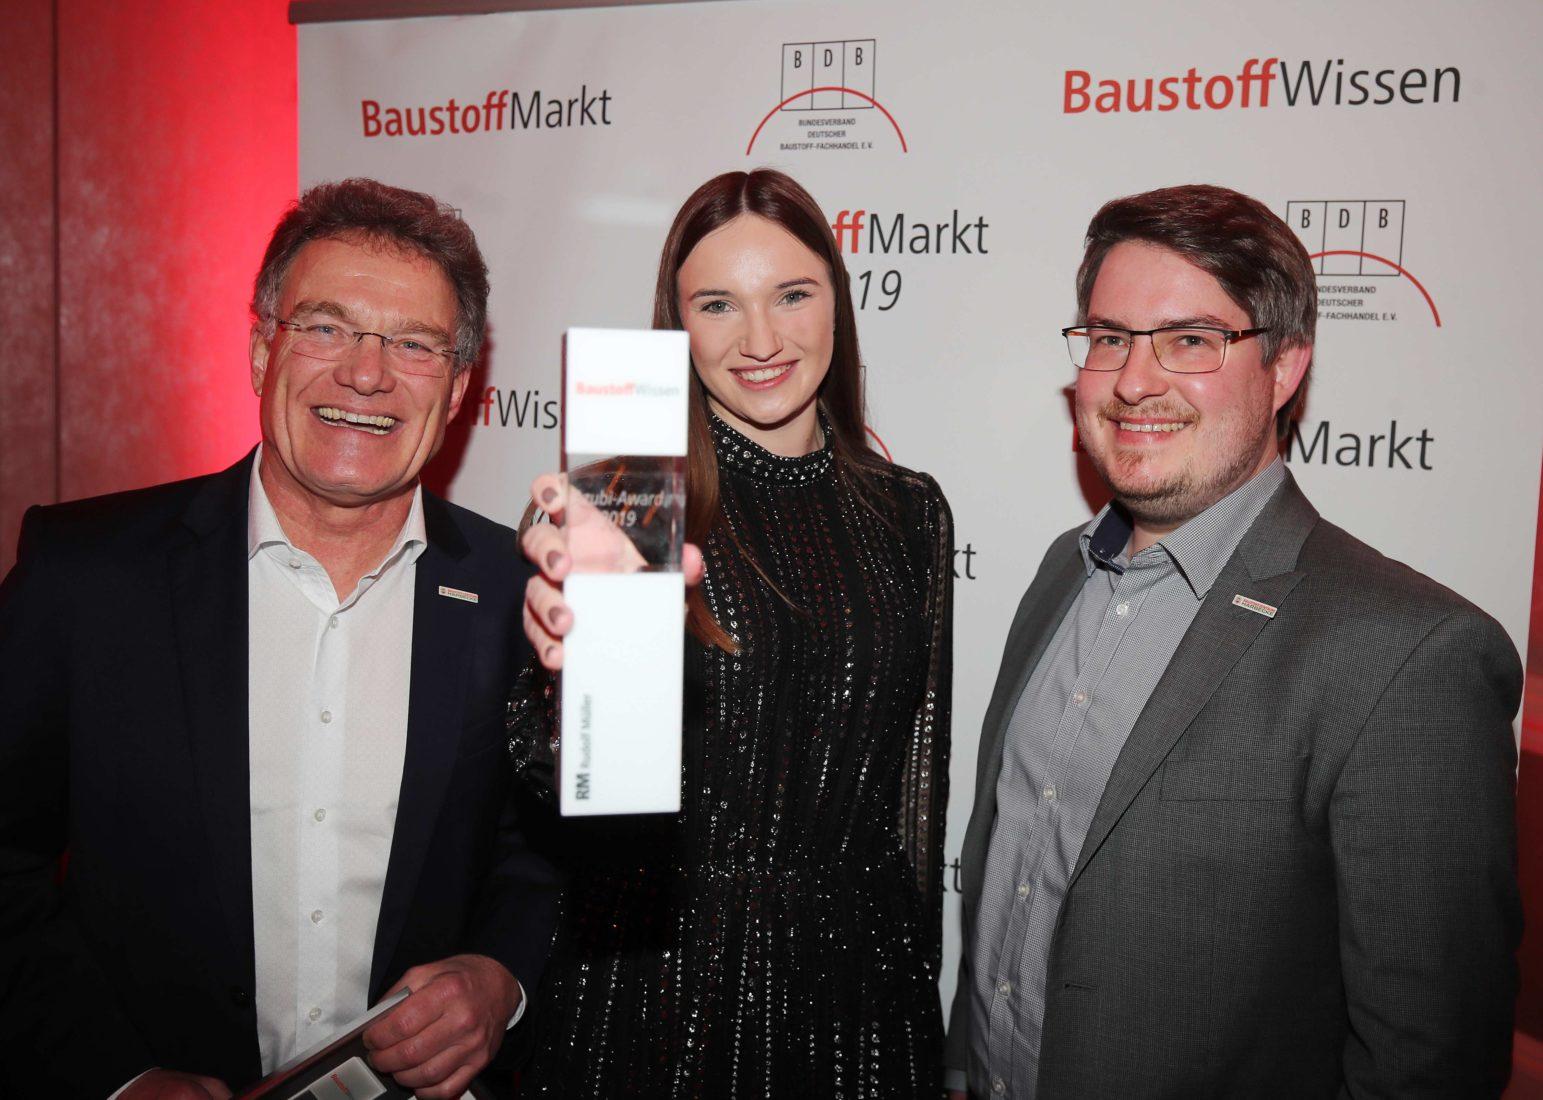 Hartmut Buhren, Anna Swertz und Timo Buhren (v. l.) nahmen den Azubi-Award entgegen. Foto: Redaktion/Thomas Kiehl